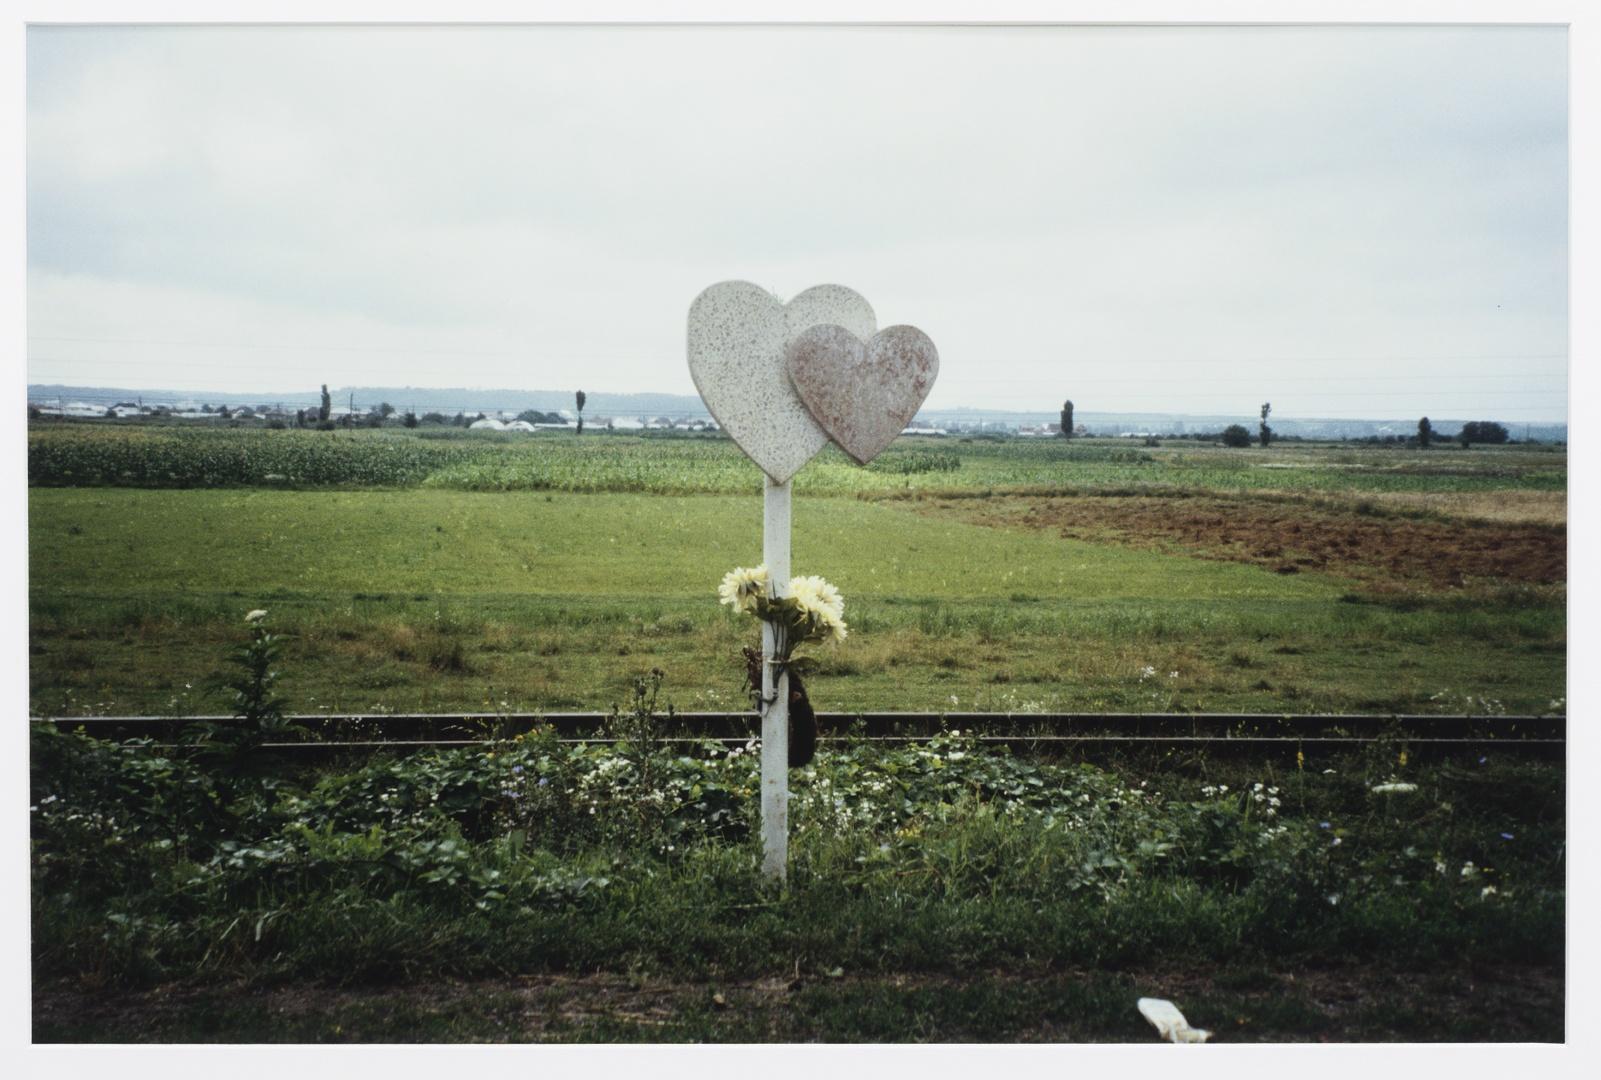 Strassenbilder, Oekraïne/Roemenië